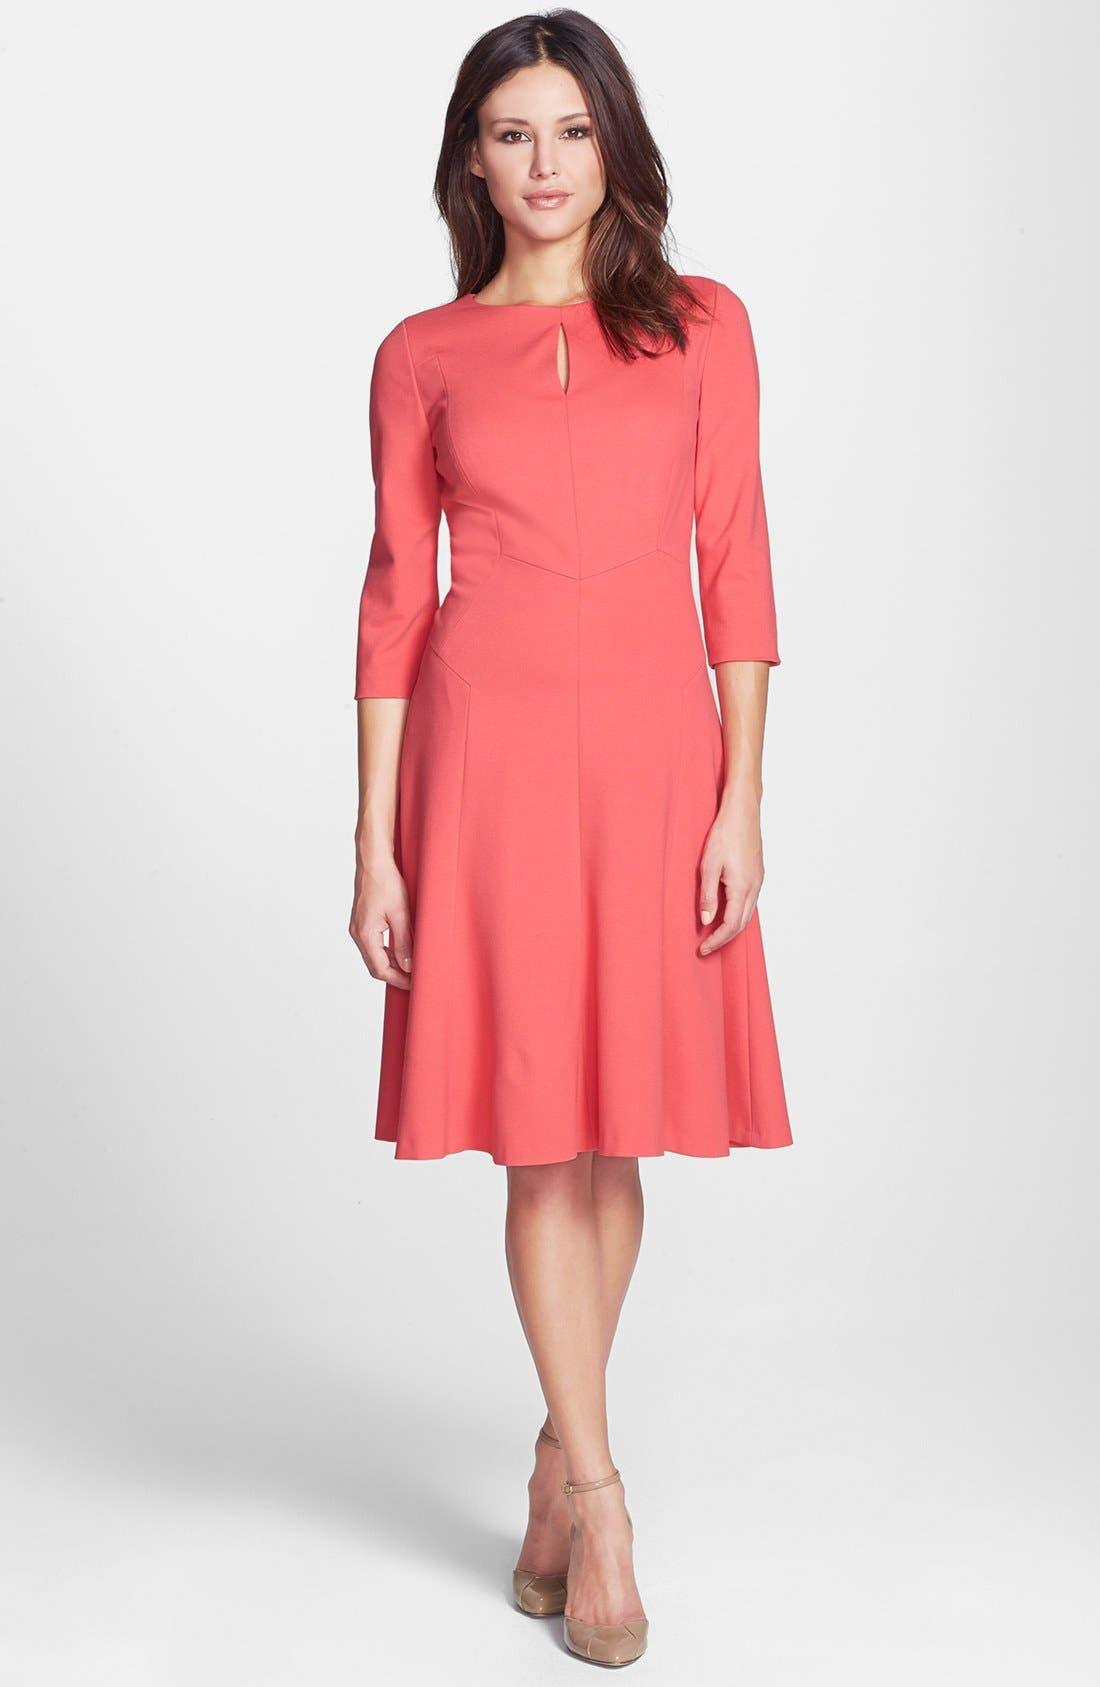 Alternate Image 1 Selected - Classiques Entier® Ponte Fit & Flare Dress